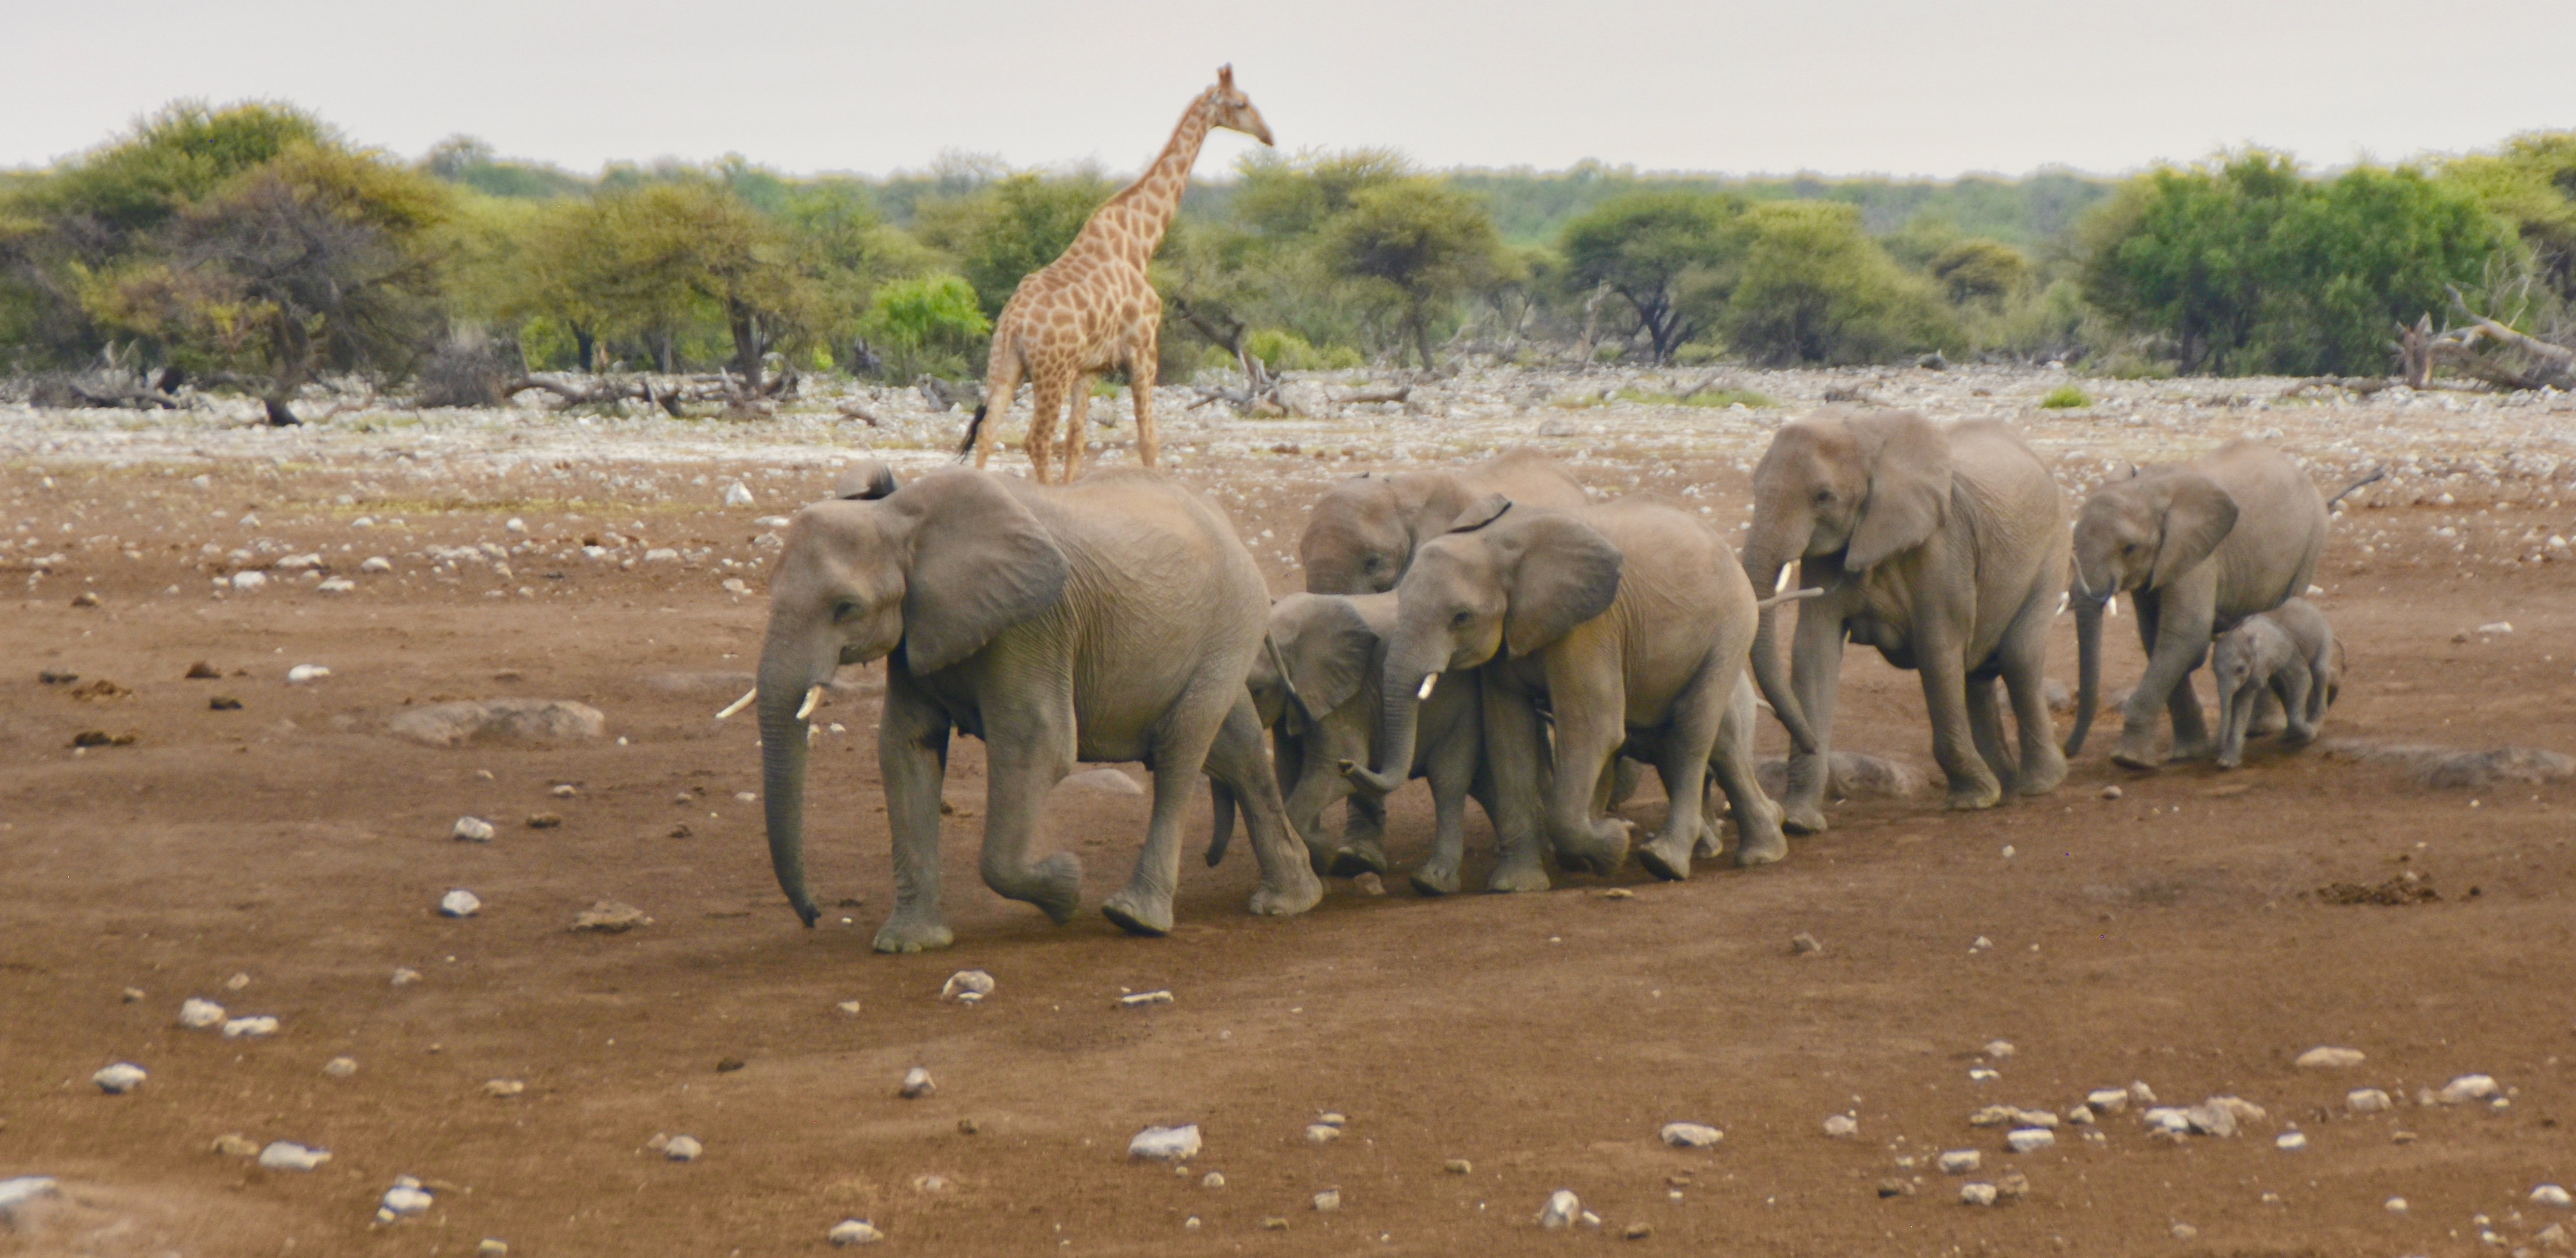 Exploring Namibia Elephants